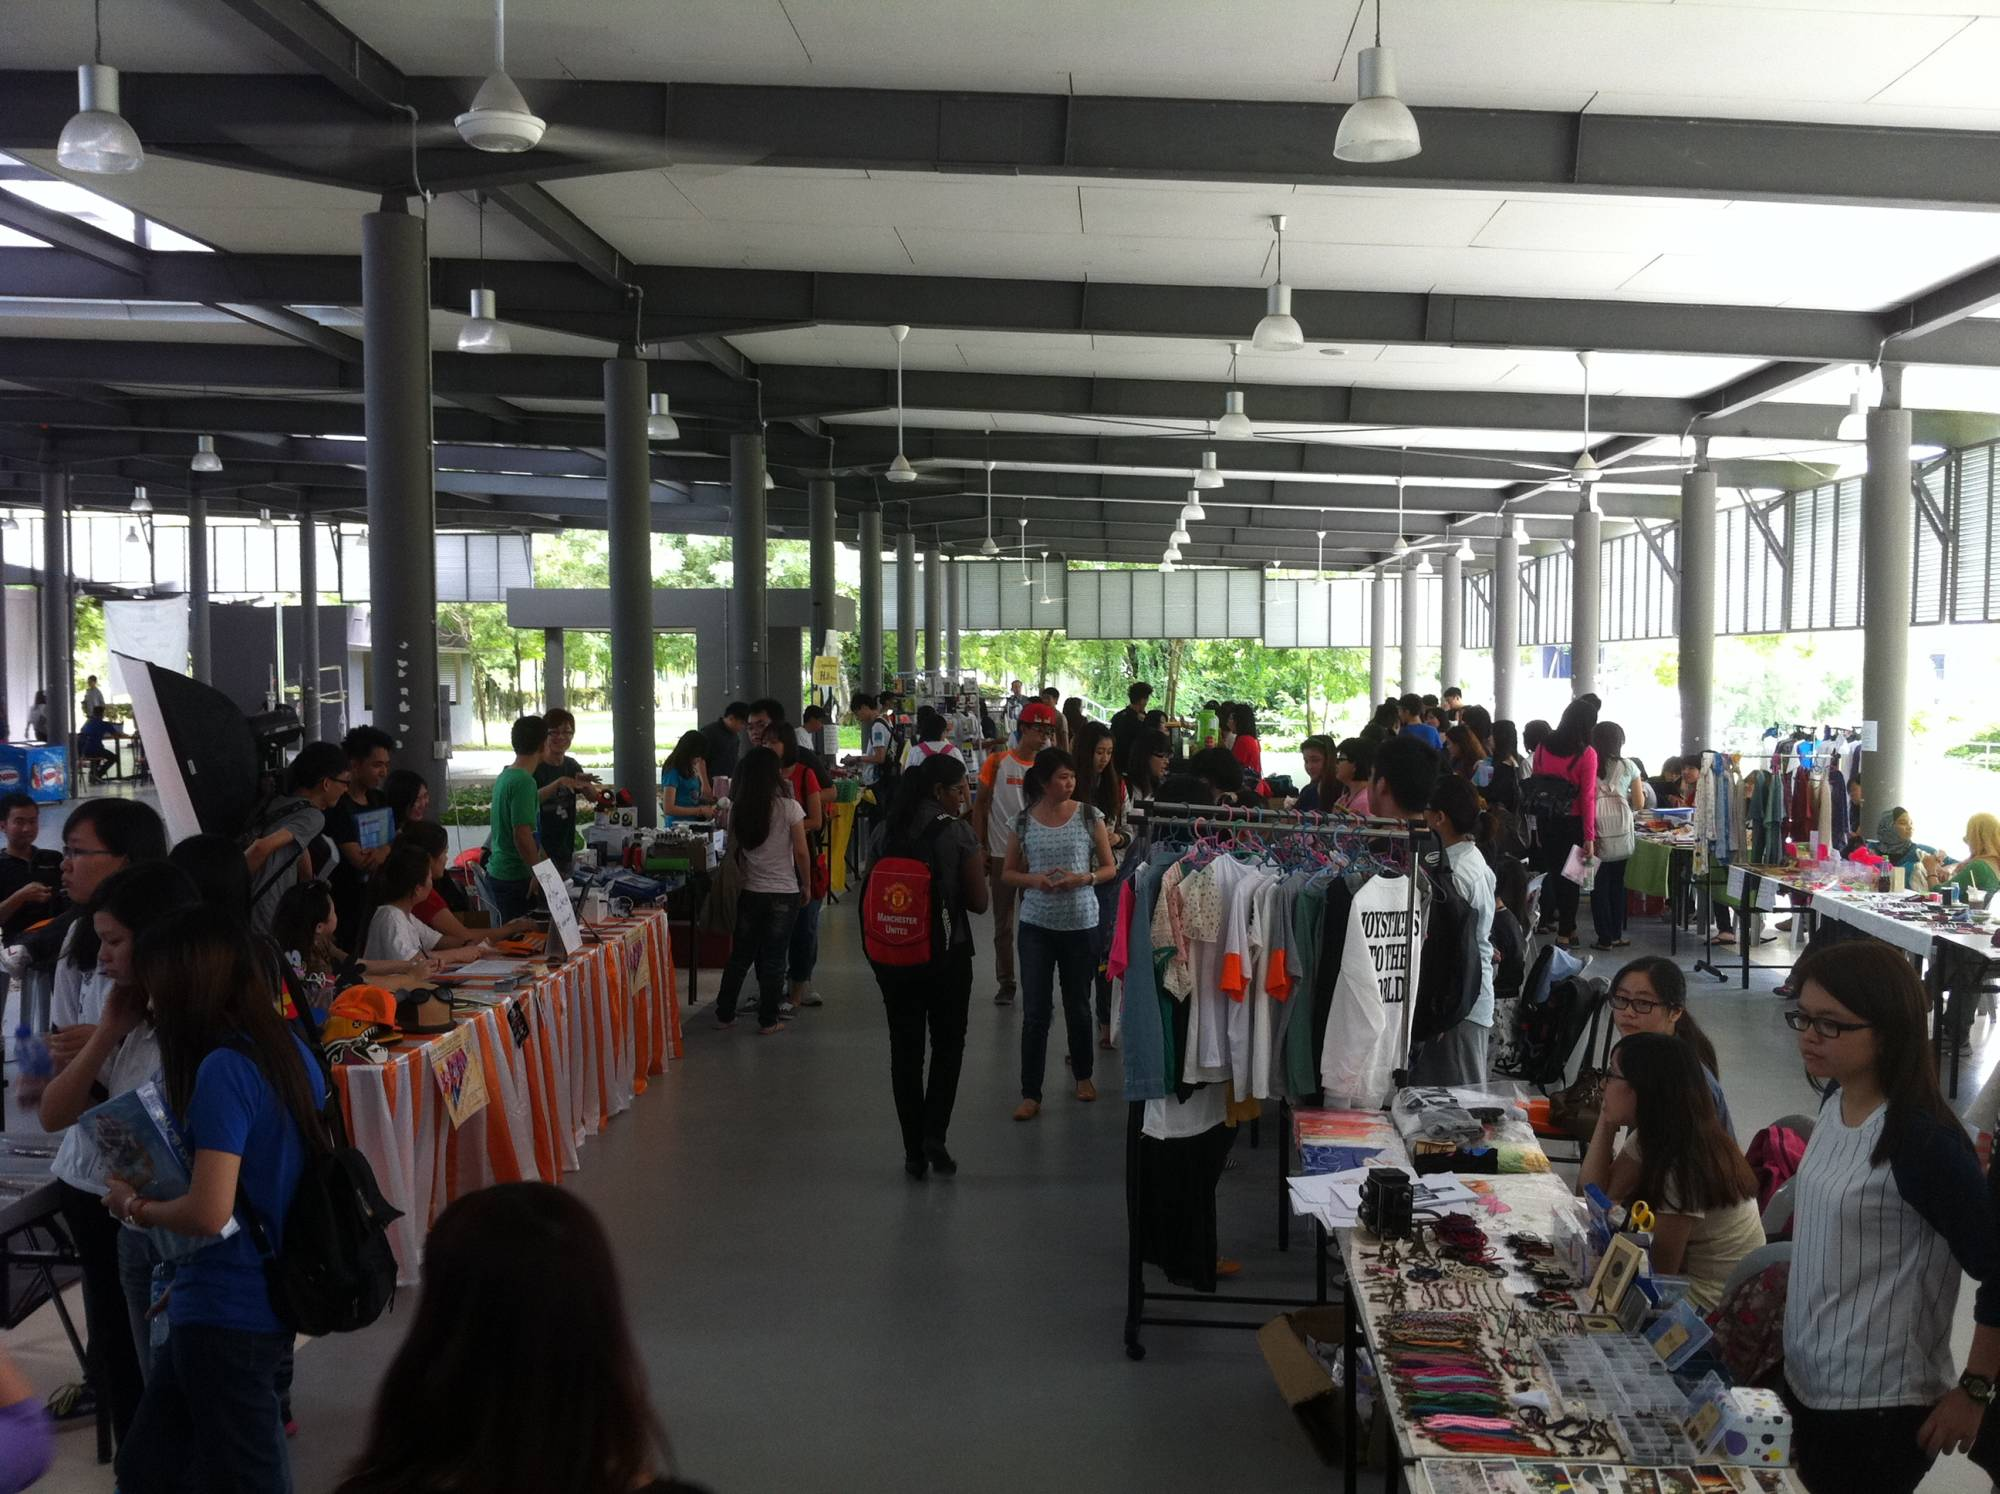 Flea Market - 13 Nov 2013